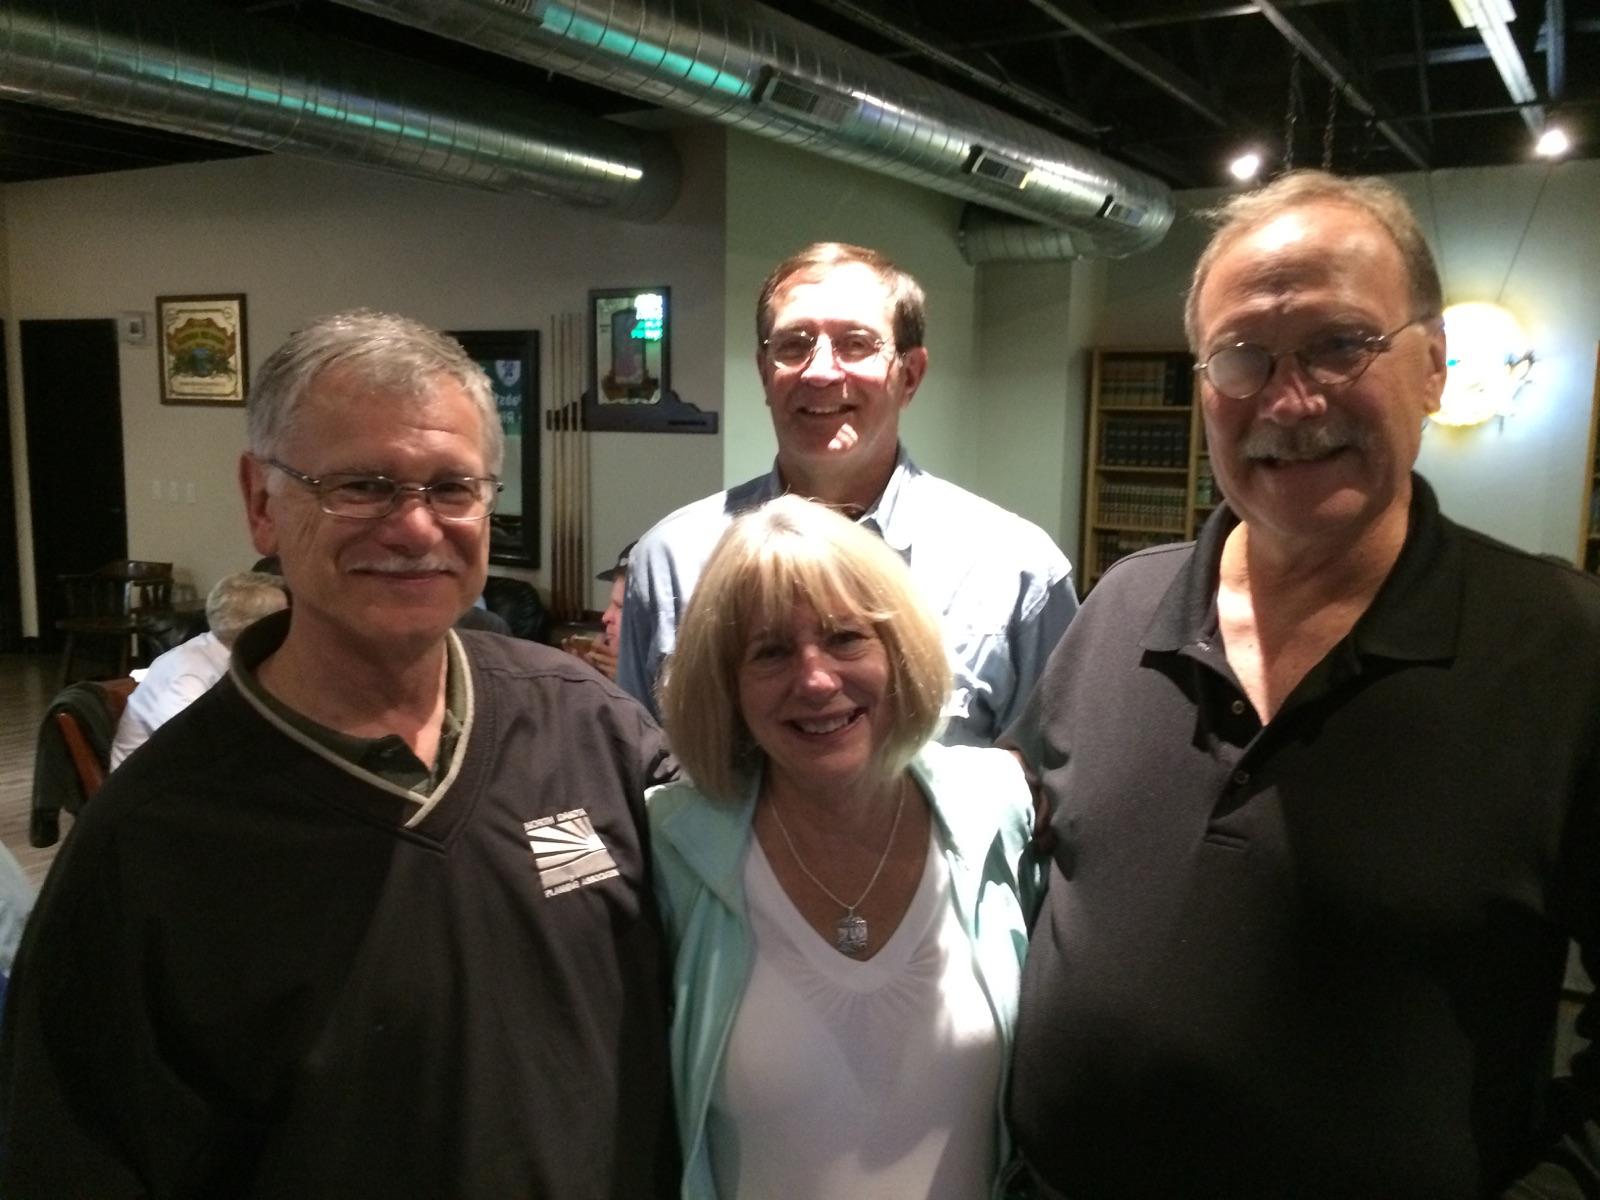 Ken with his friends at a Western Planner conference.  Ken Waido, right; Joanne Garnett, center; Larry Weil, left; Ben Orsbon, back.